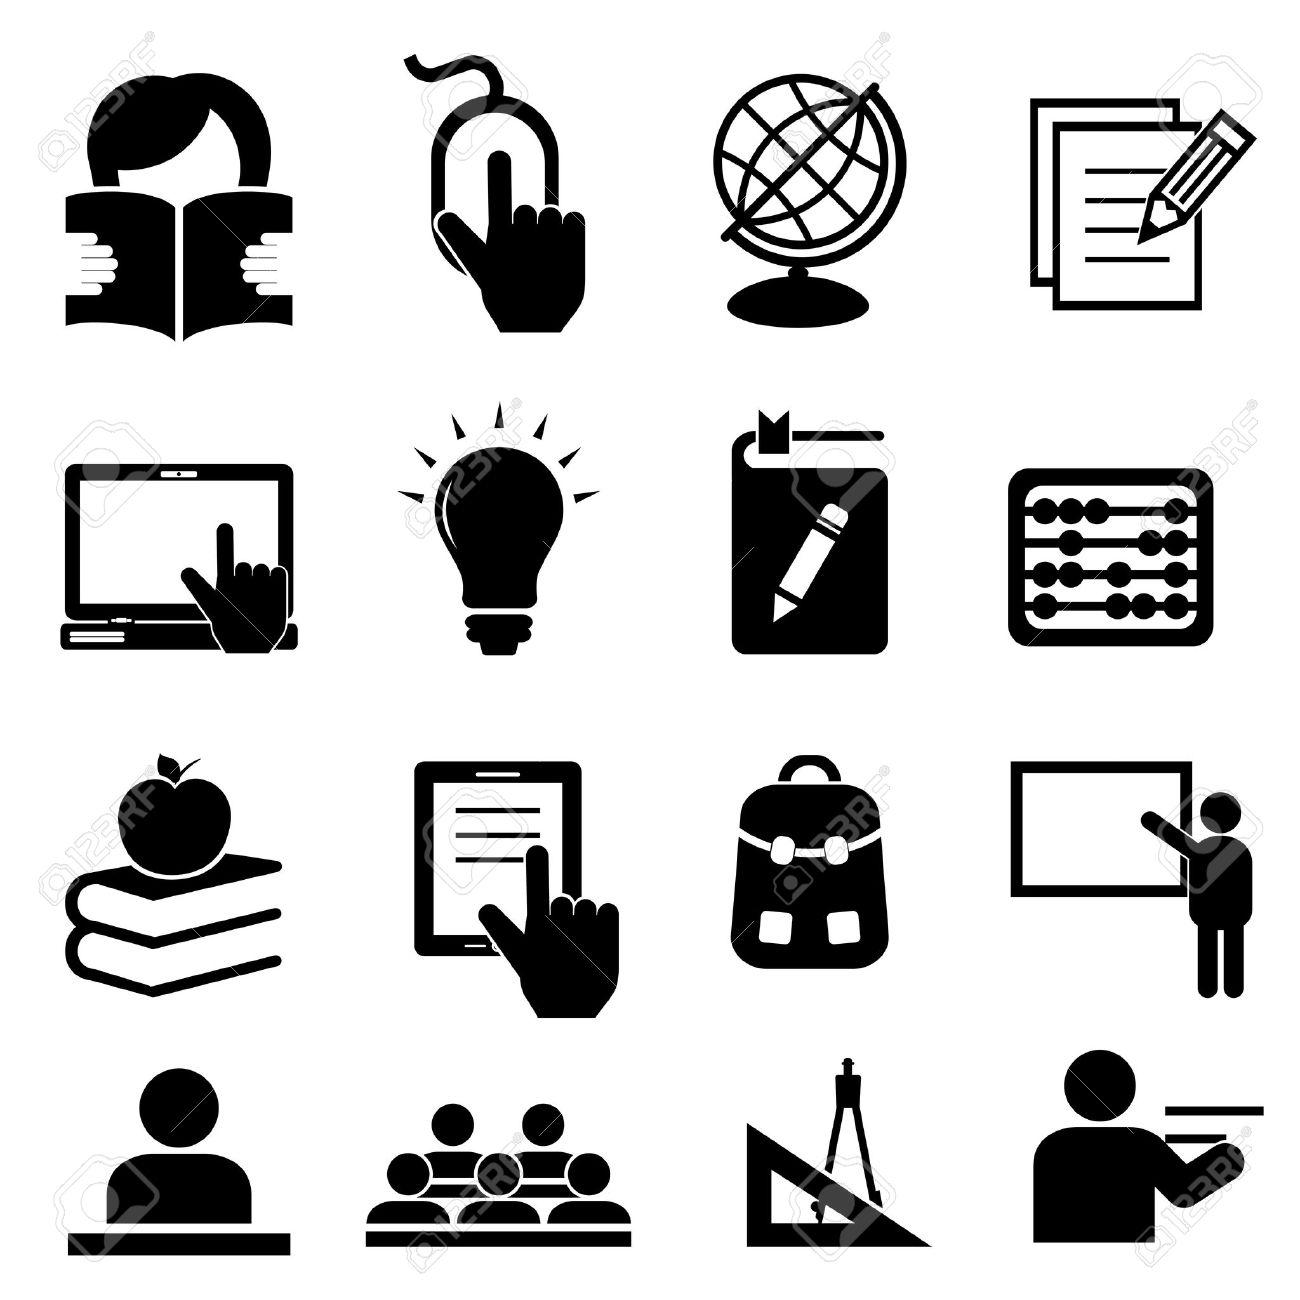 Back to school icon set - 21409555